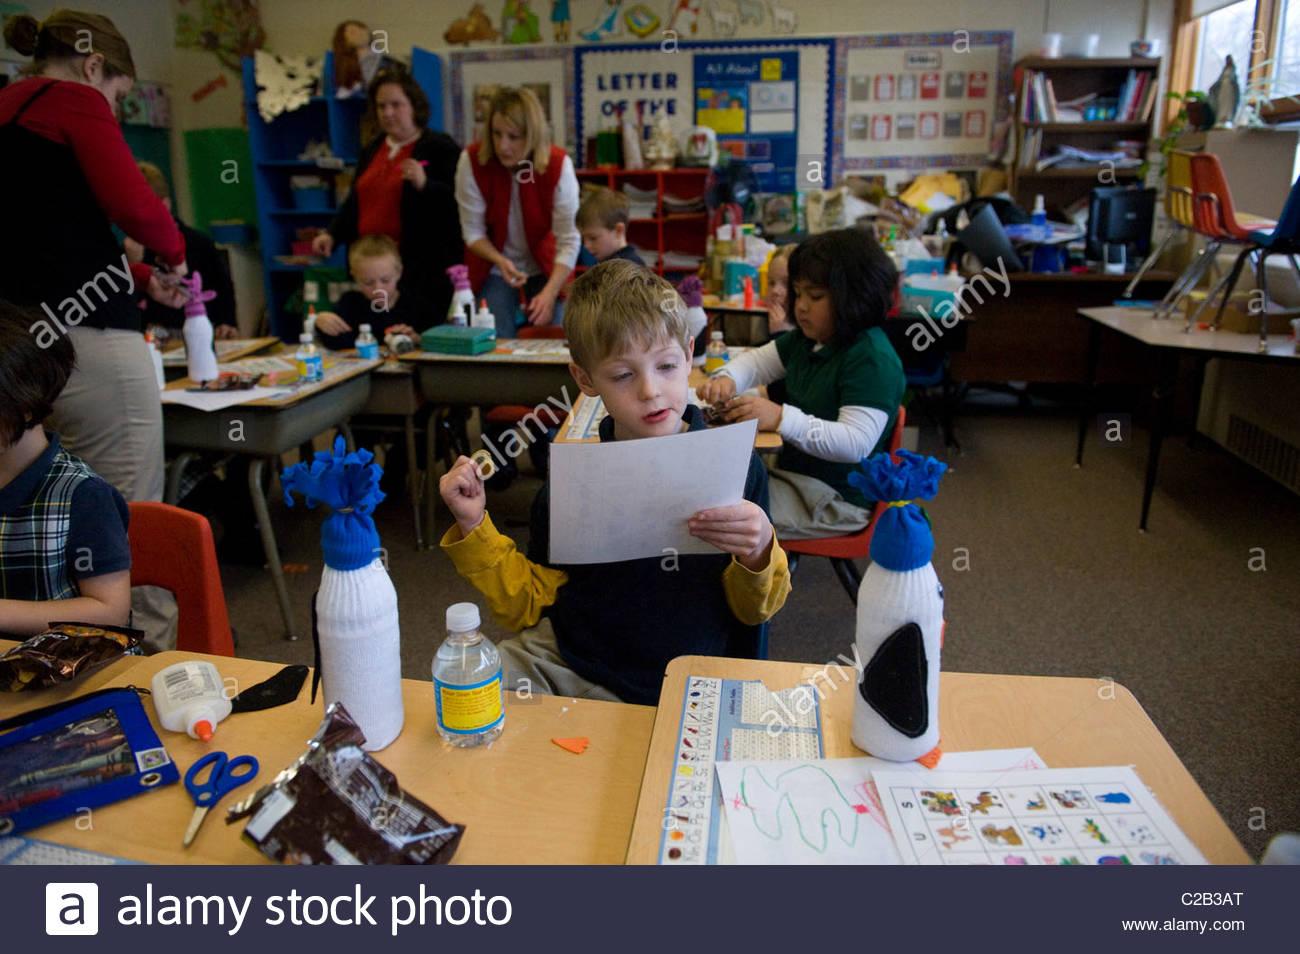 Inside a kindergarten classroom in Lincoln, Nebraska. - Stock Image